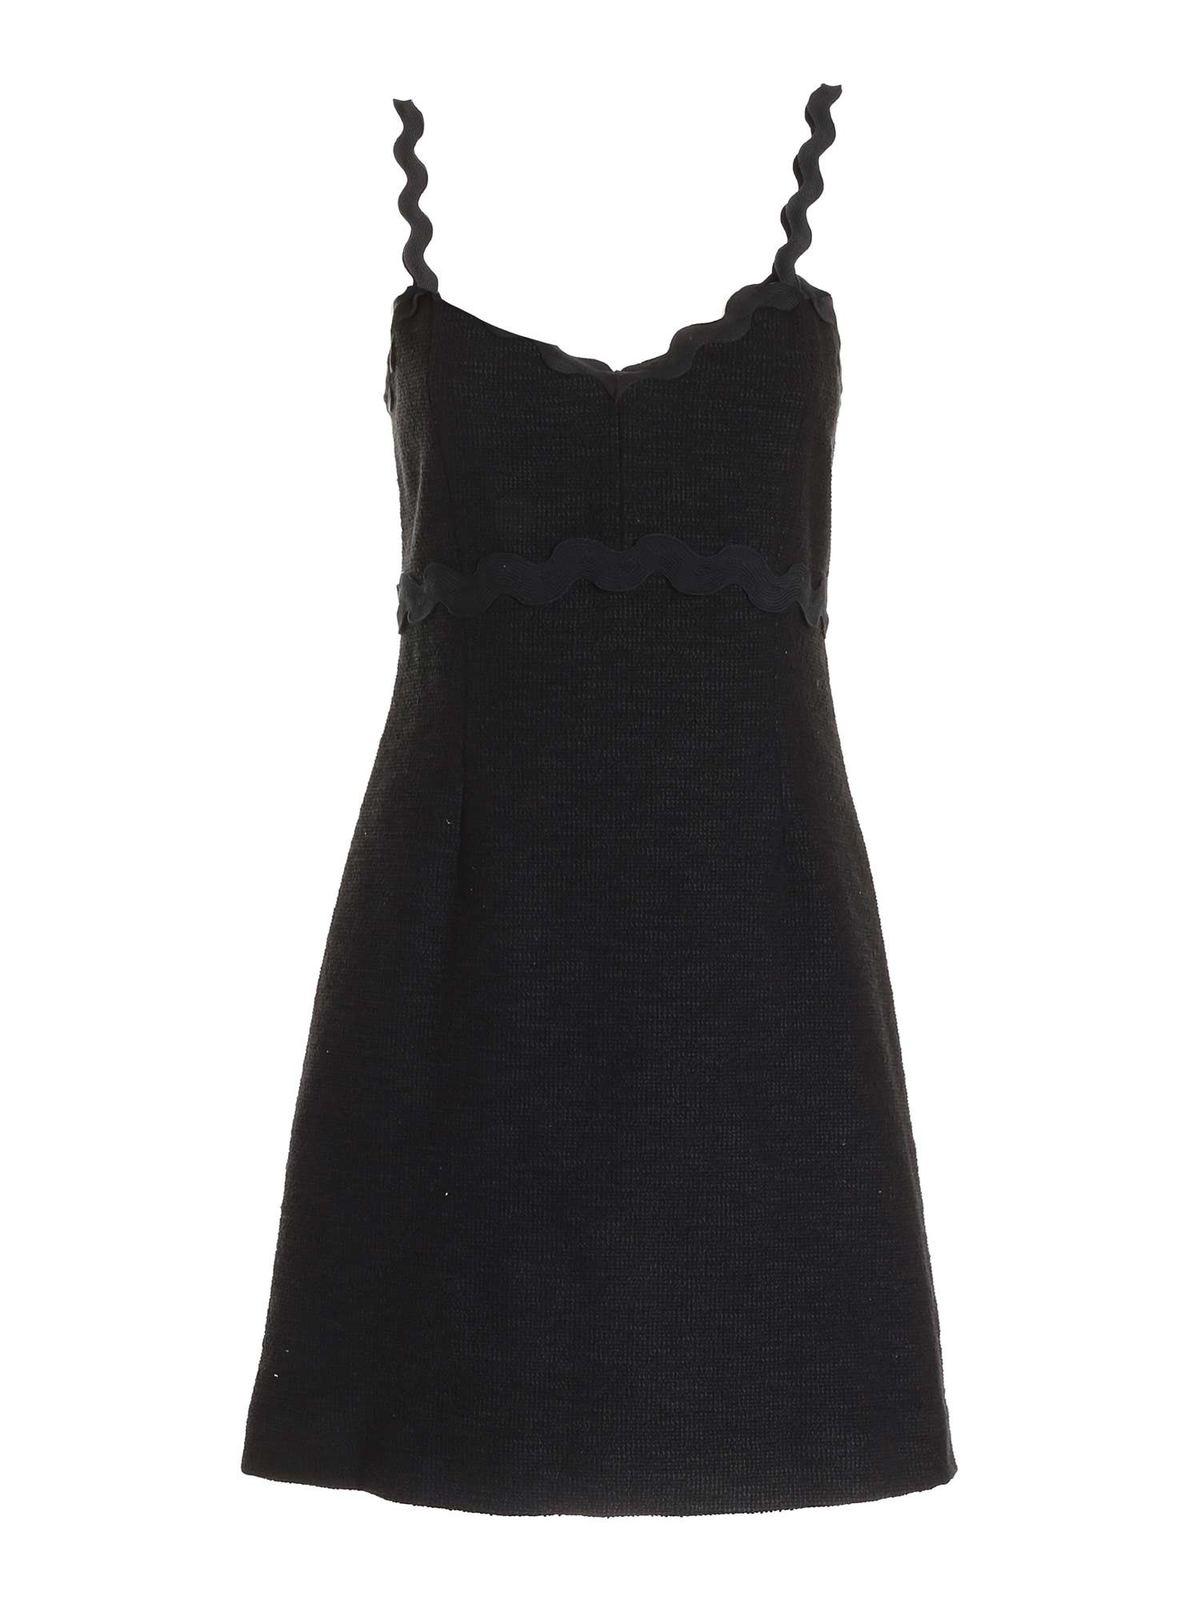 Pinko Cottons IMPAVIDO DRESS IN BLACK